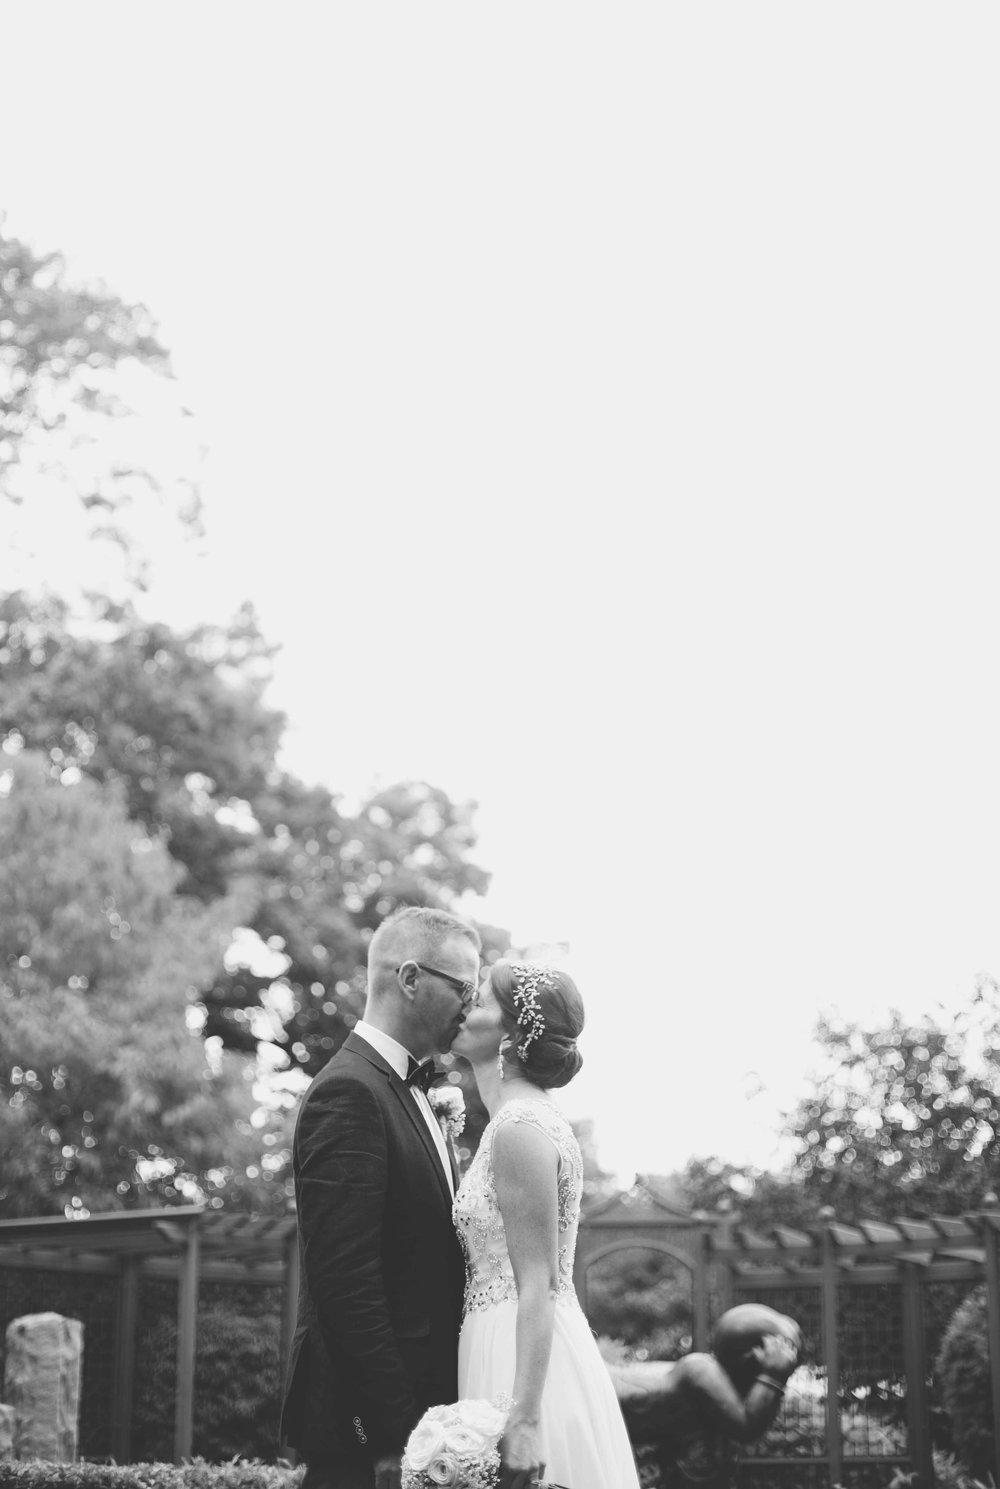 Runcorn-Town-Hall-Cheshire-Wedding-photographer-Heather-Elizabeth (47 of 89).jpg